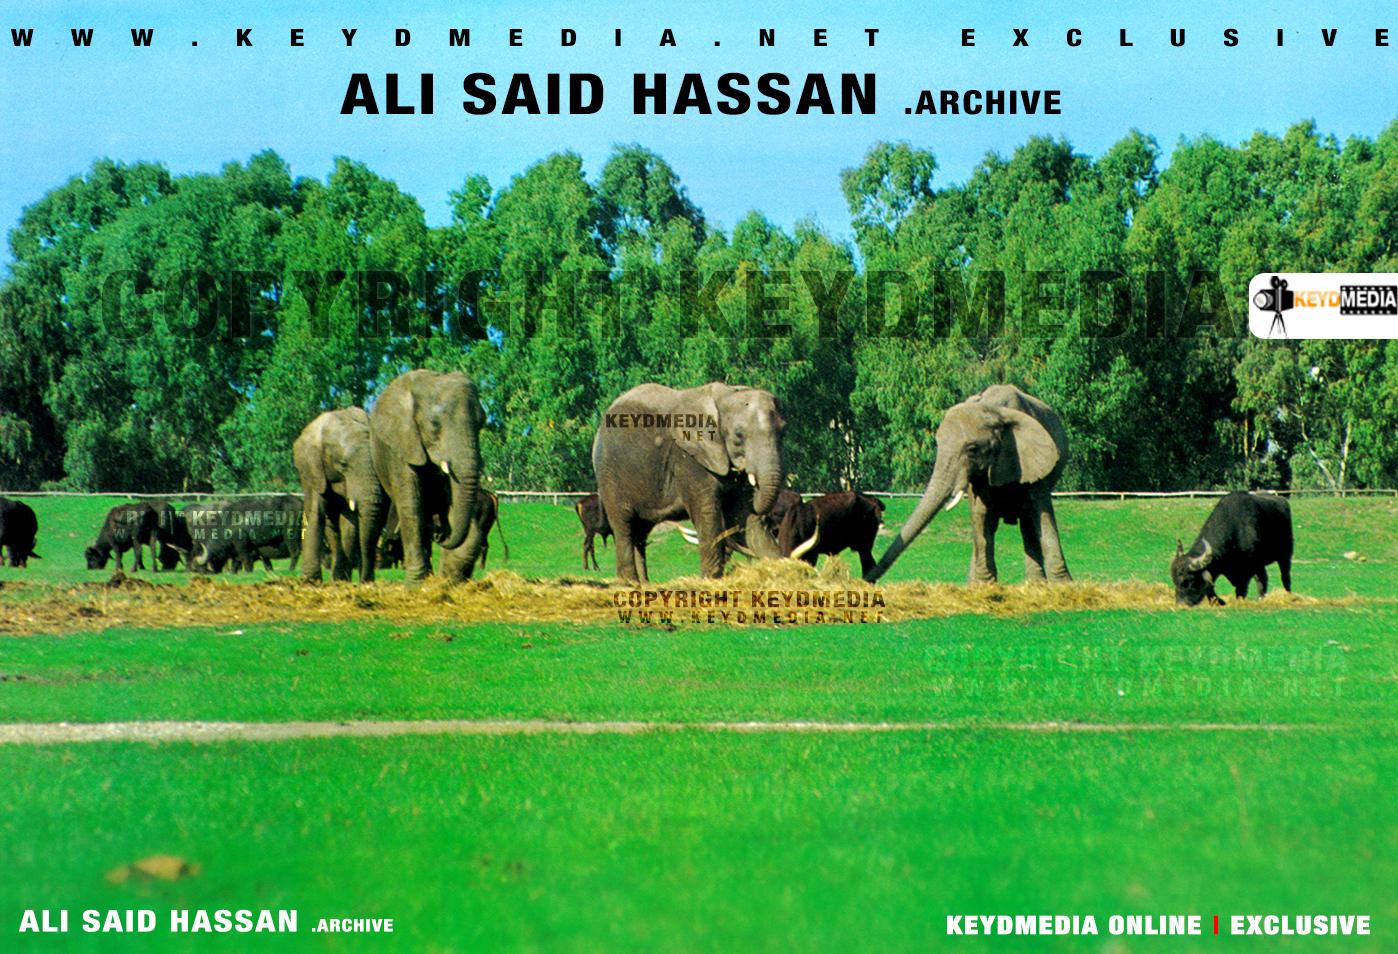 Bandhiga Asbuuca: Somali National Park - Kismaayo - 1978 Picture by Ali Said Hassan